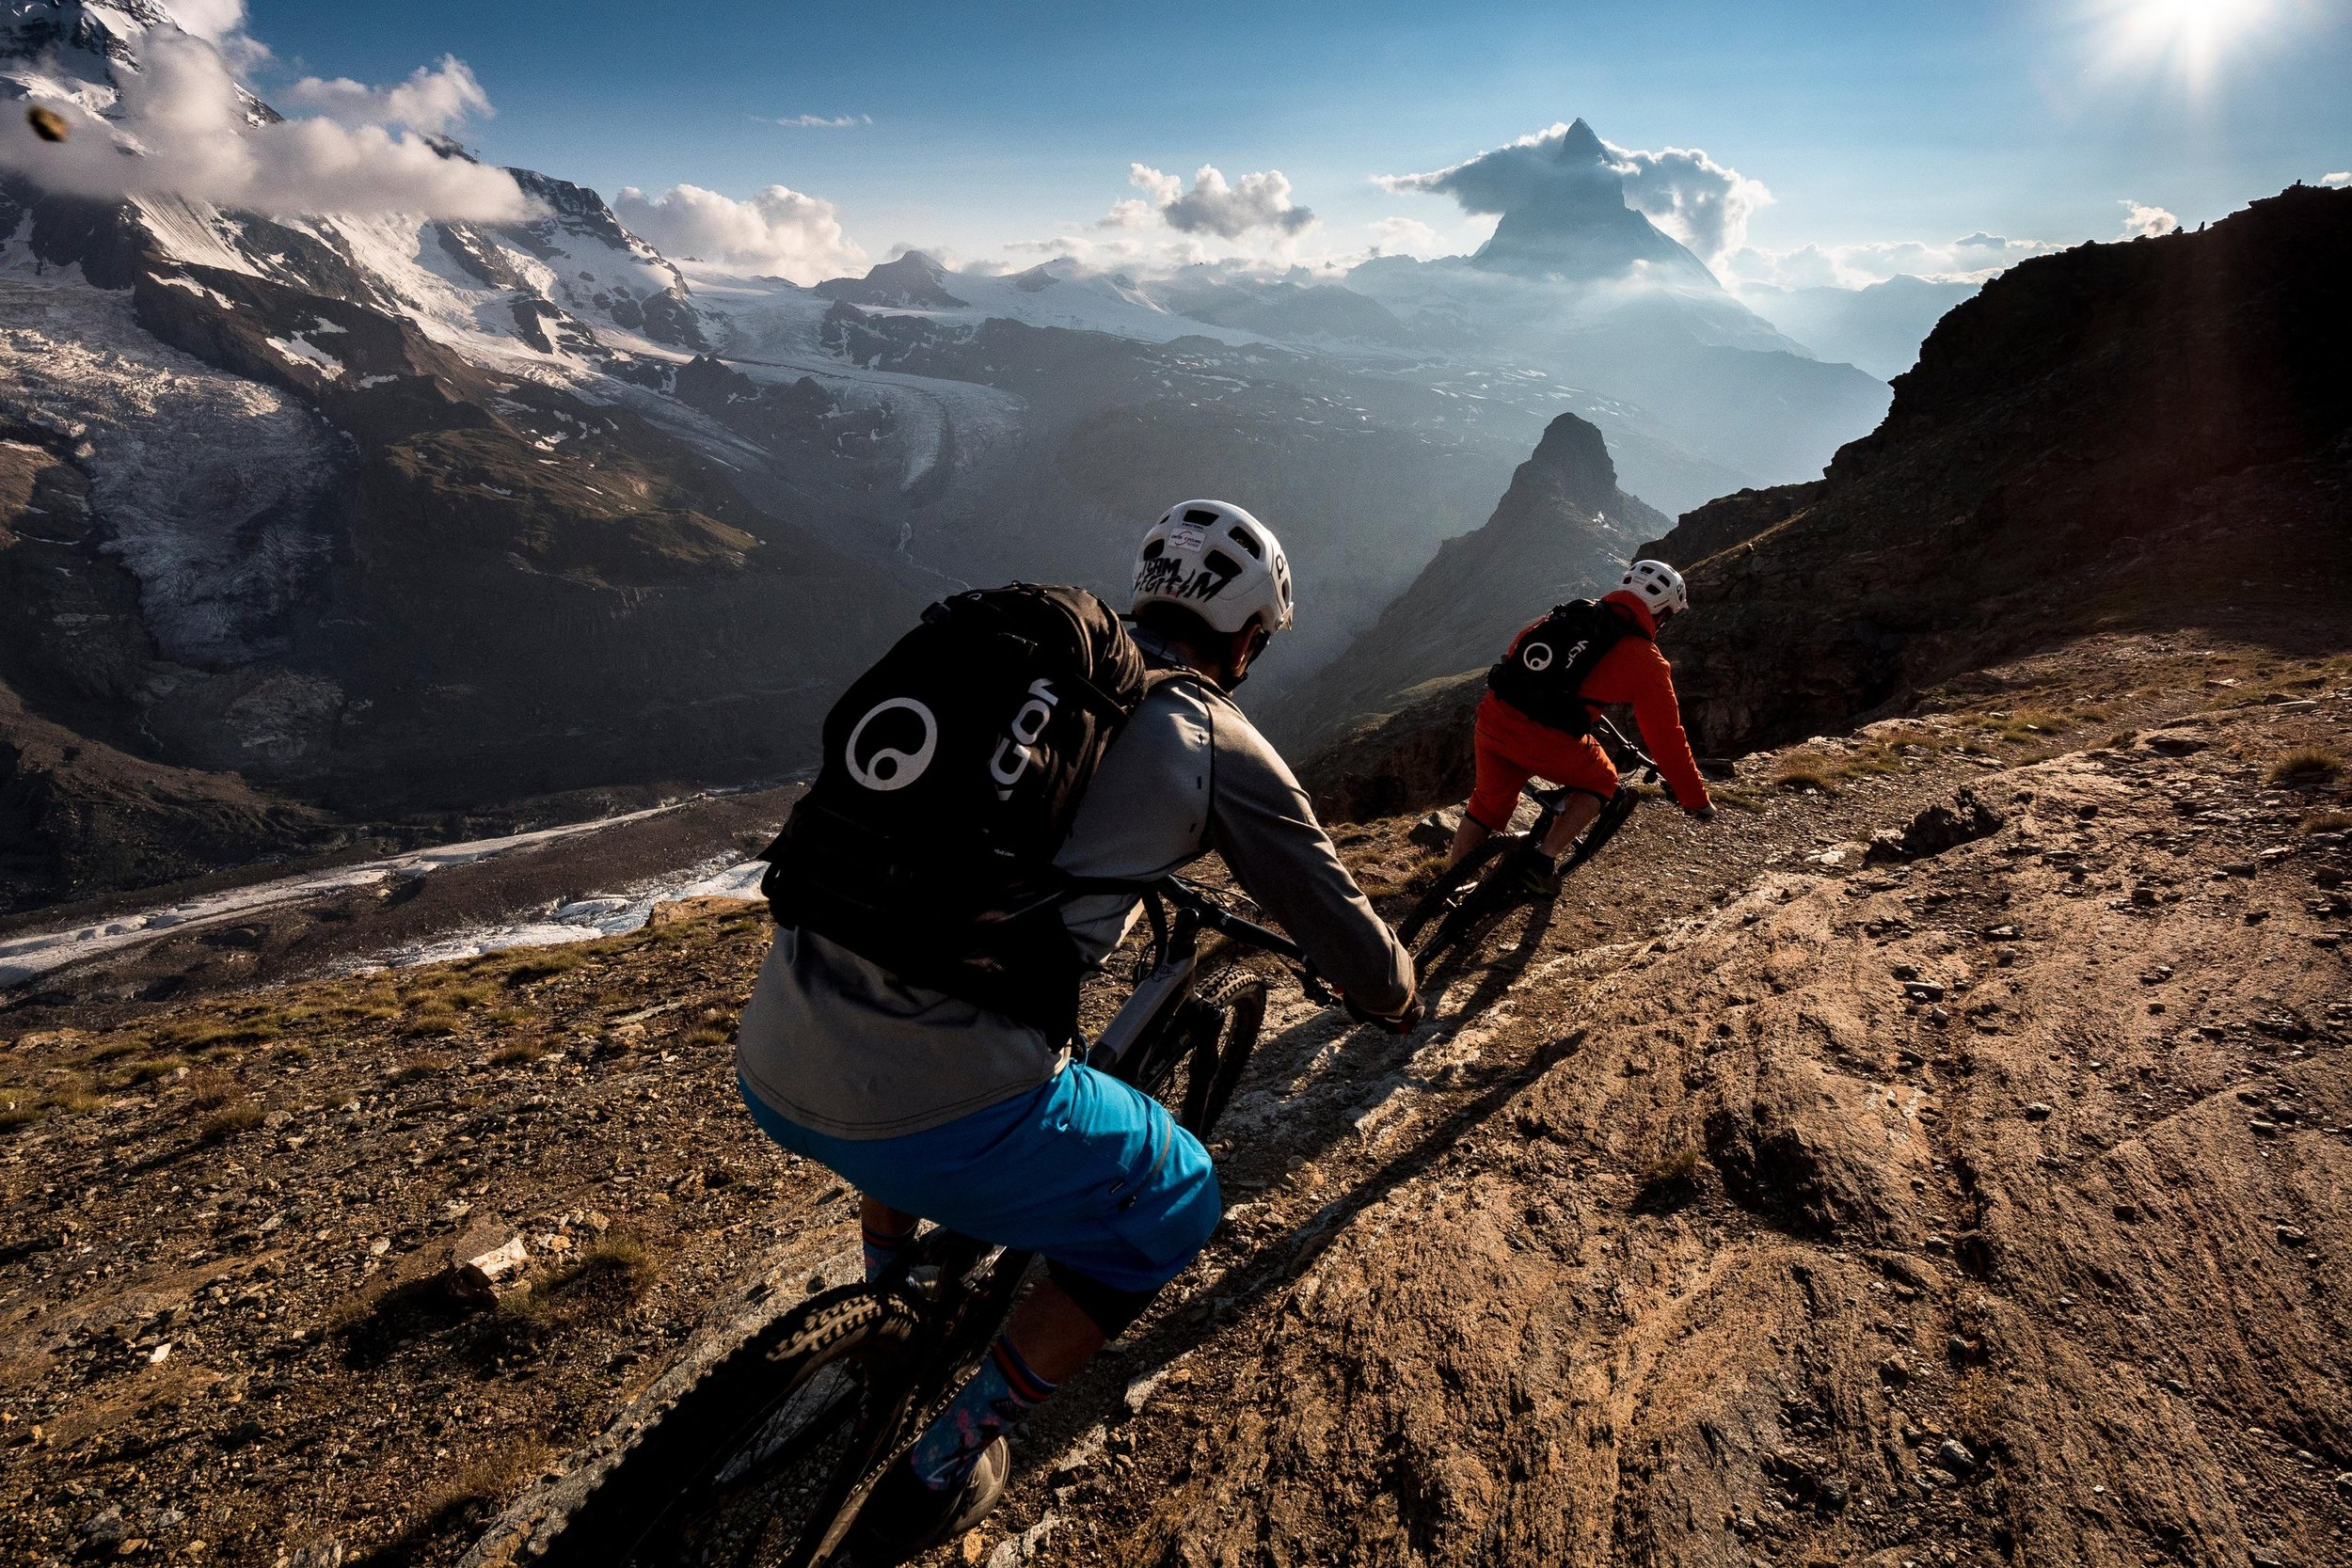 mtb-zermatt-gornergrat-descent.jpg